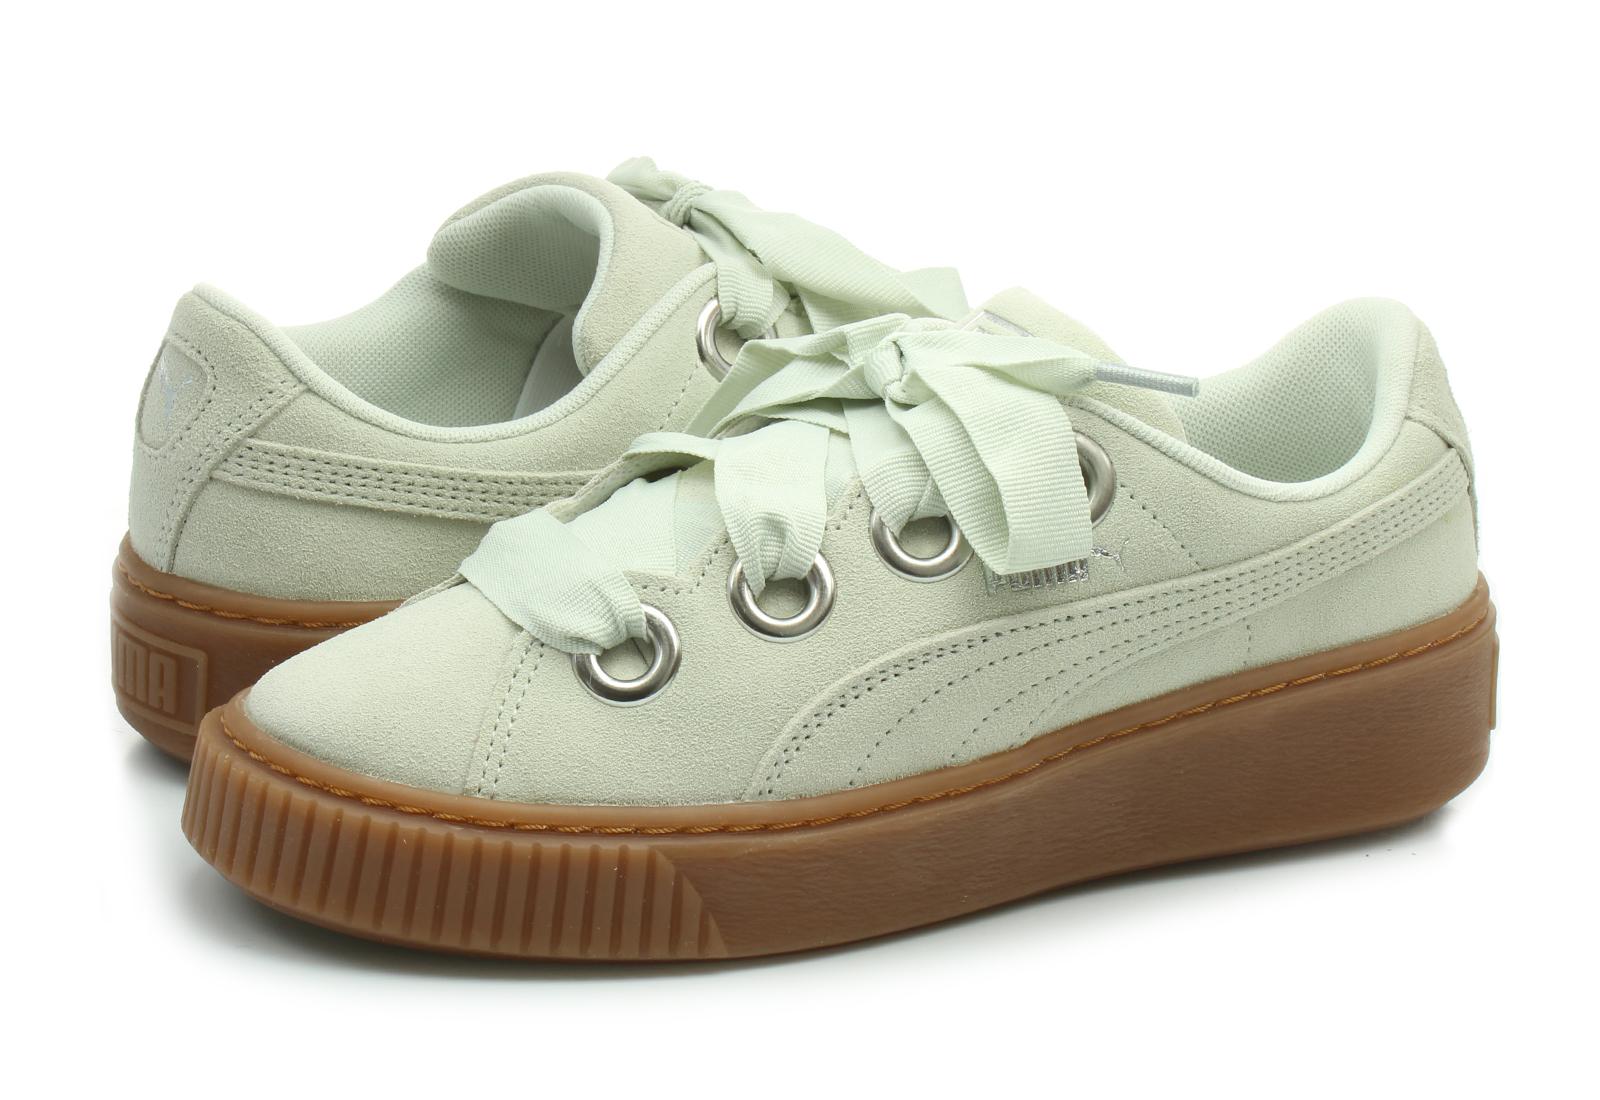 Puma Shoes - Platform V2 Suede - 36646102-sil - Online shop for ... 7defb34b6b